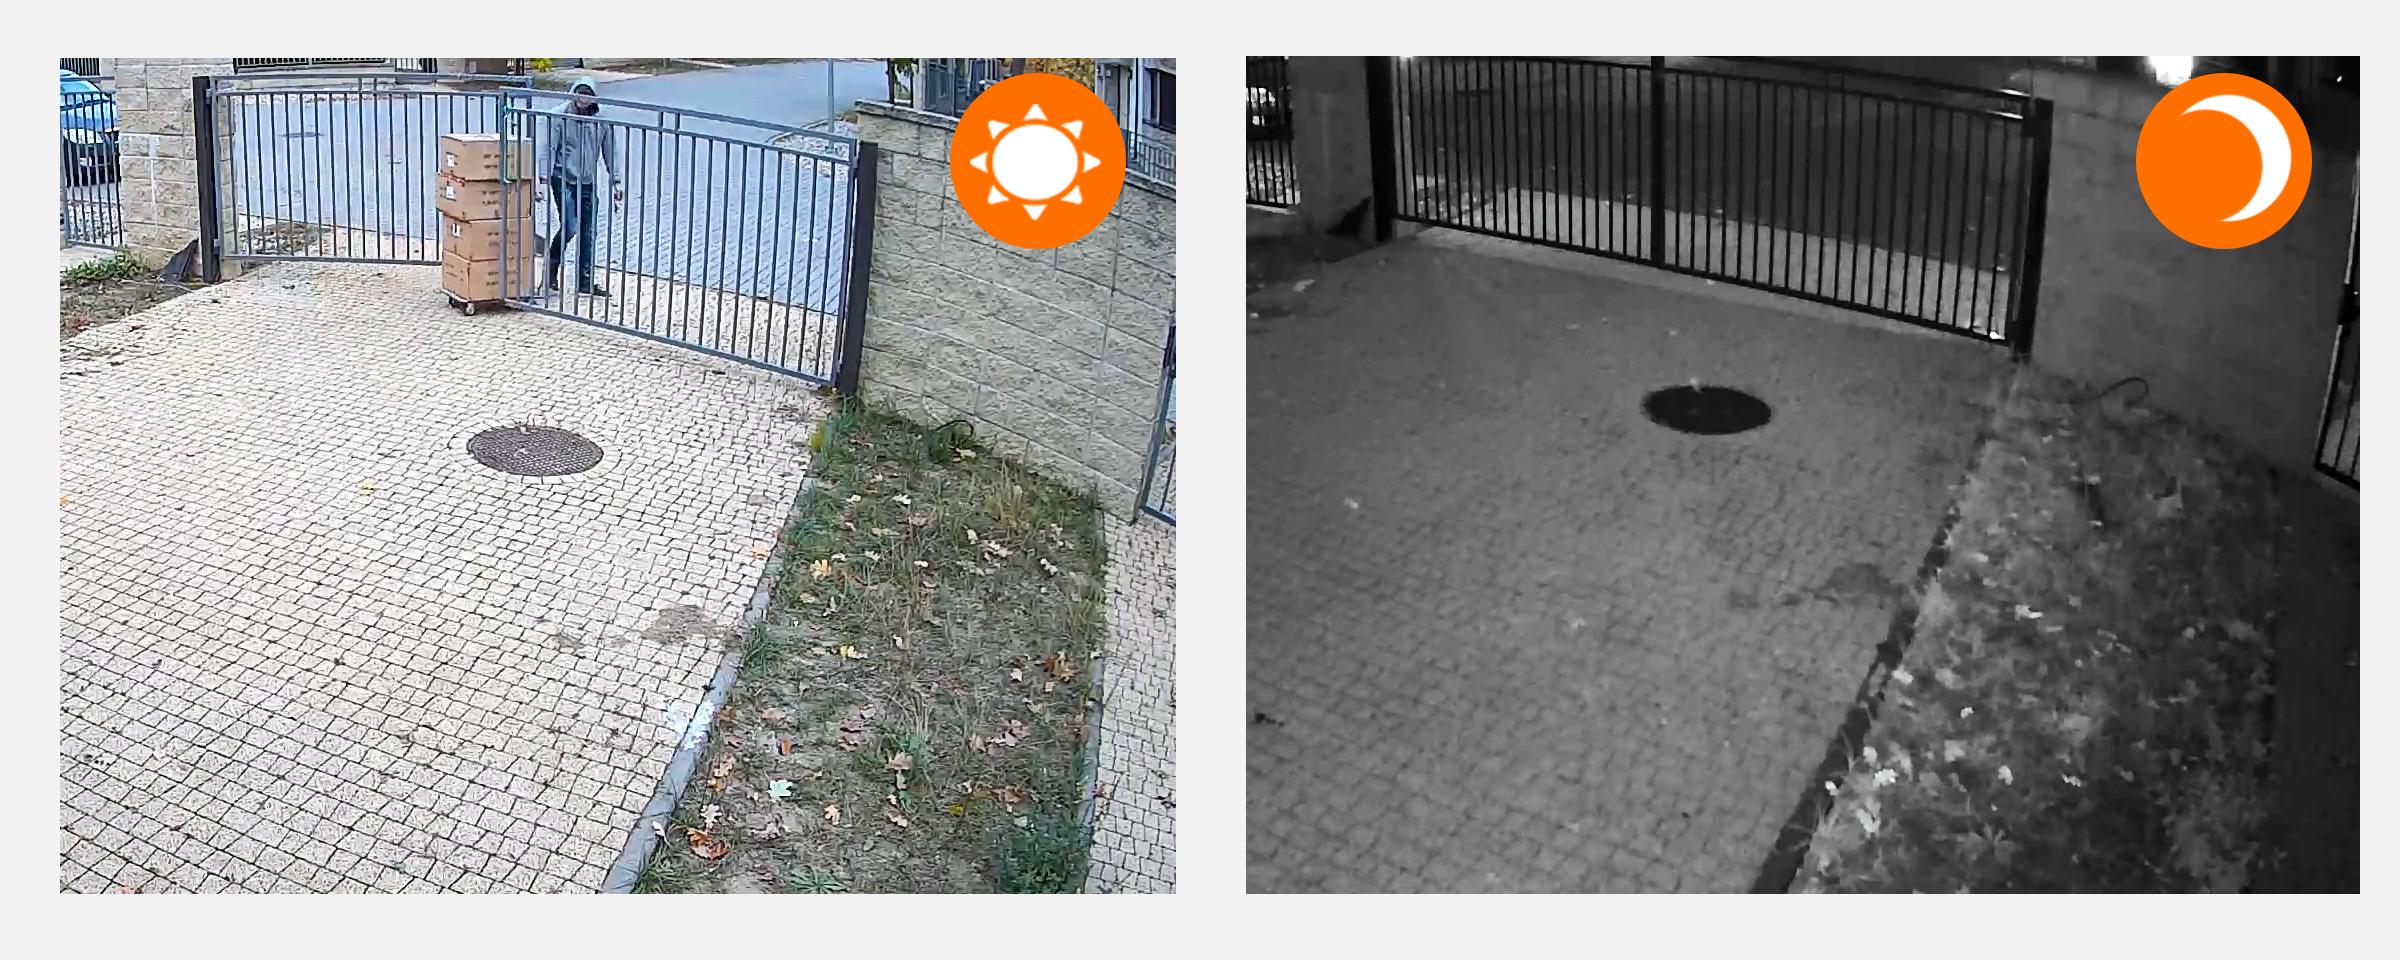 kamera na podczerwien widok dzien noc orllo.pl